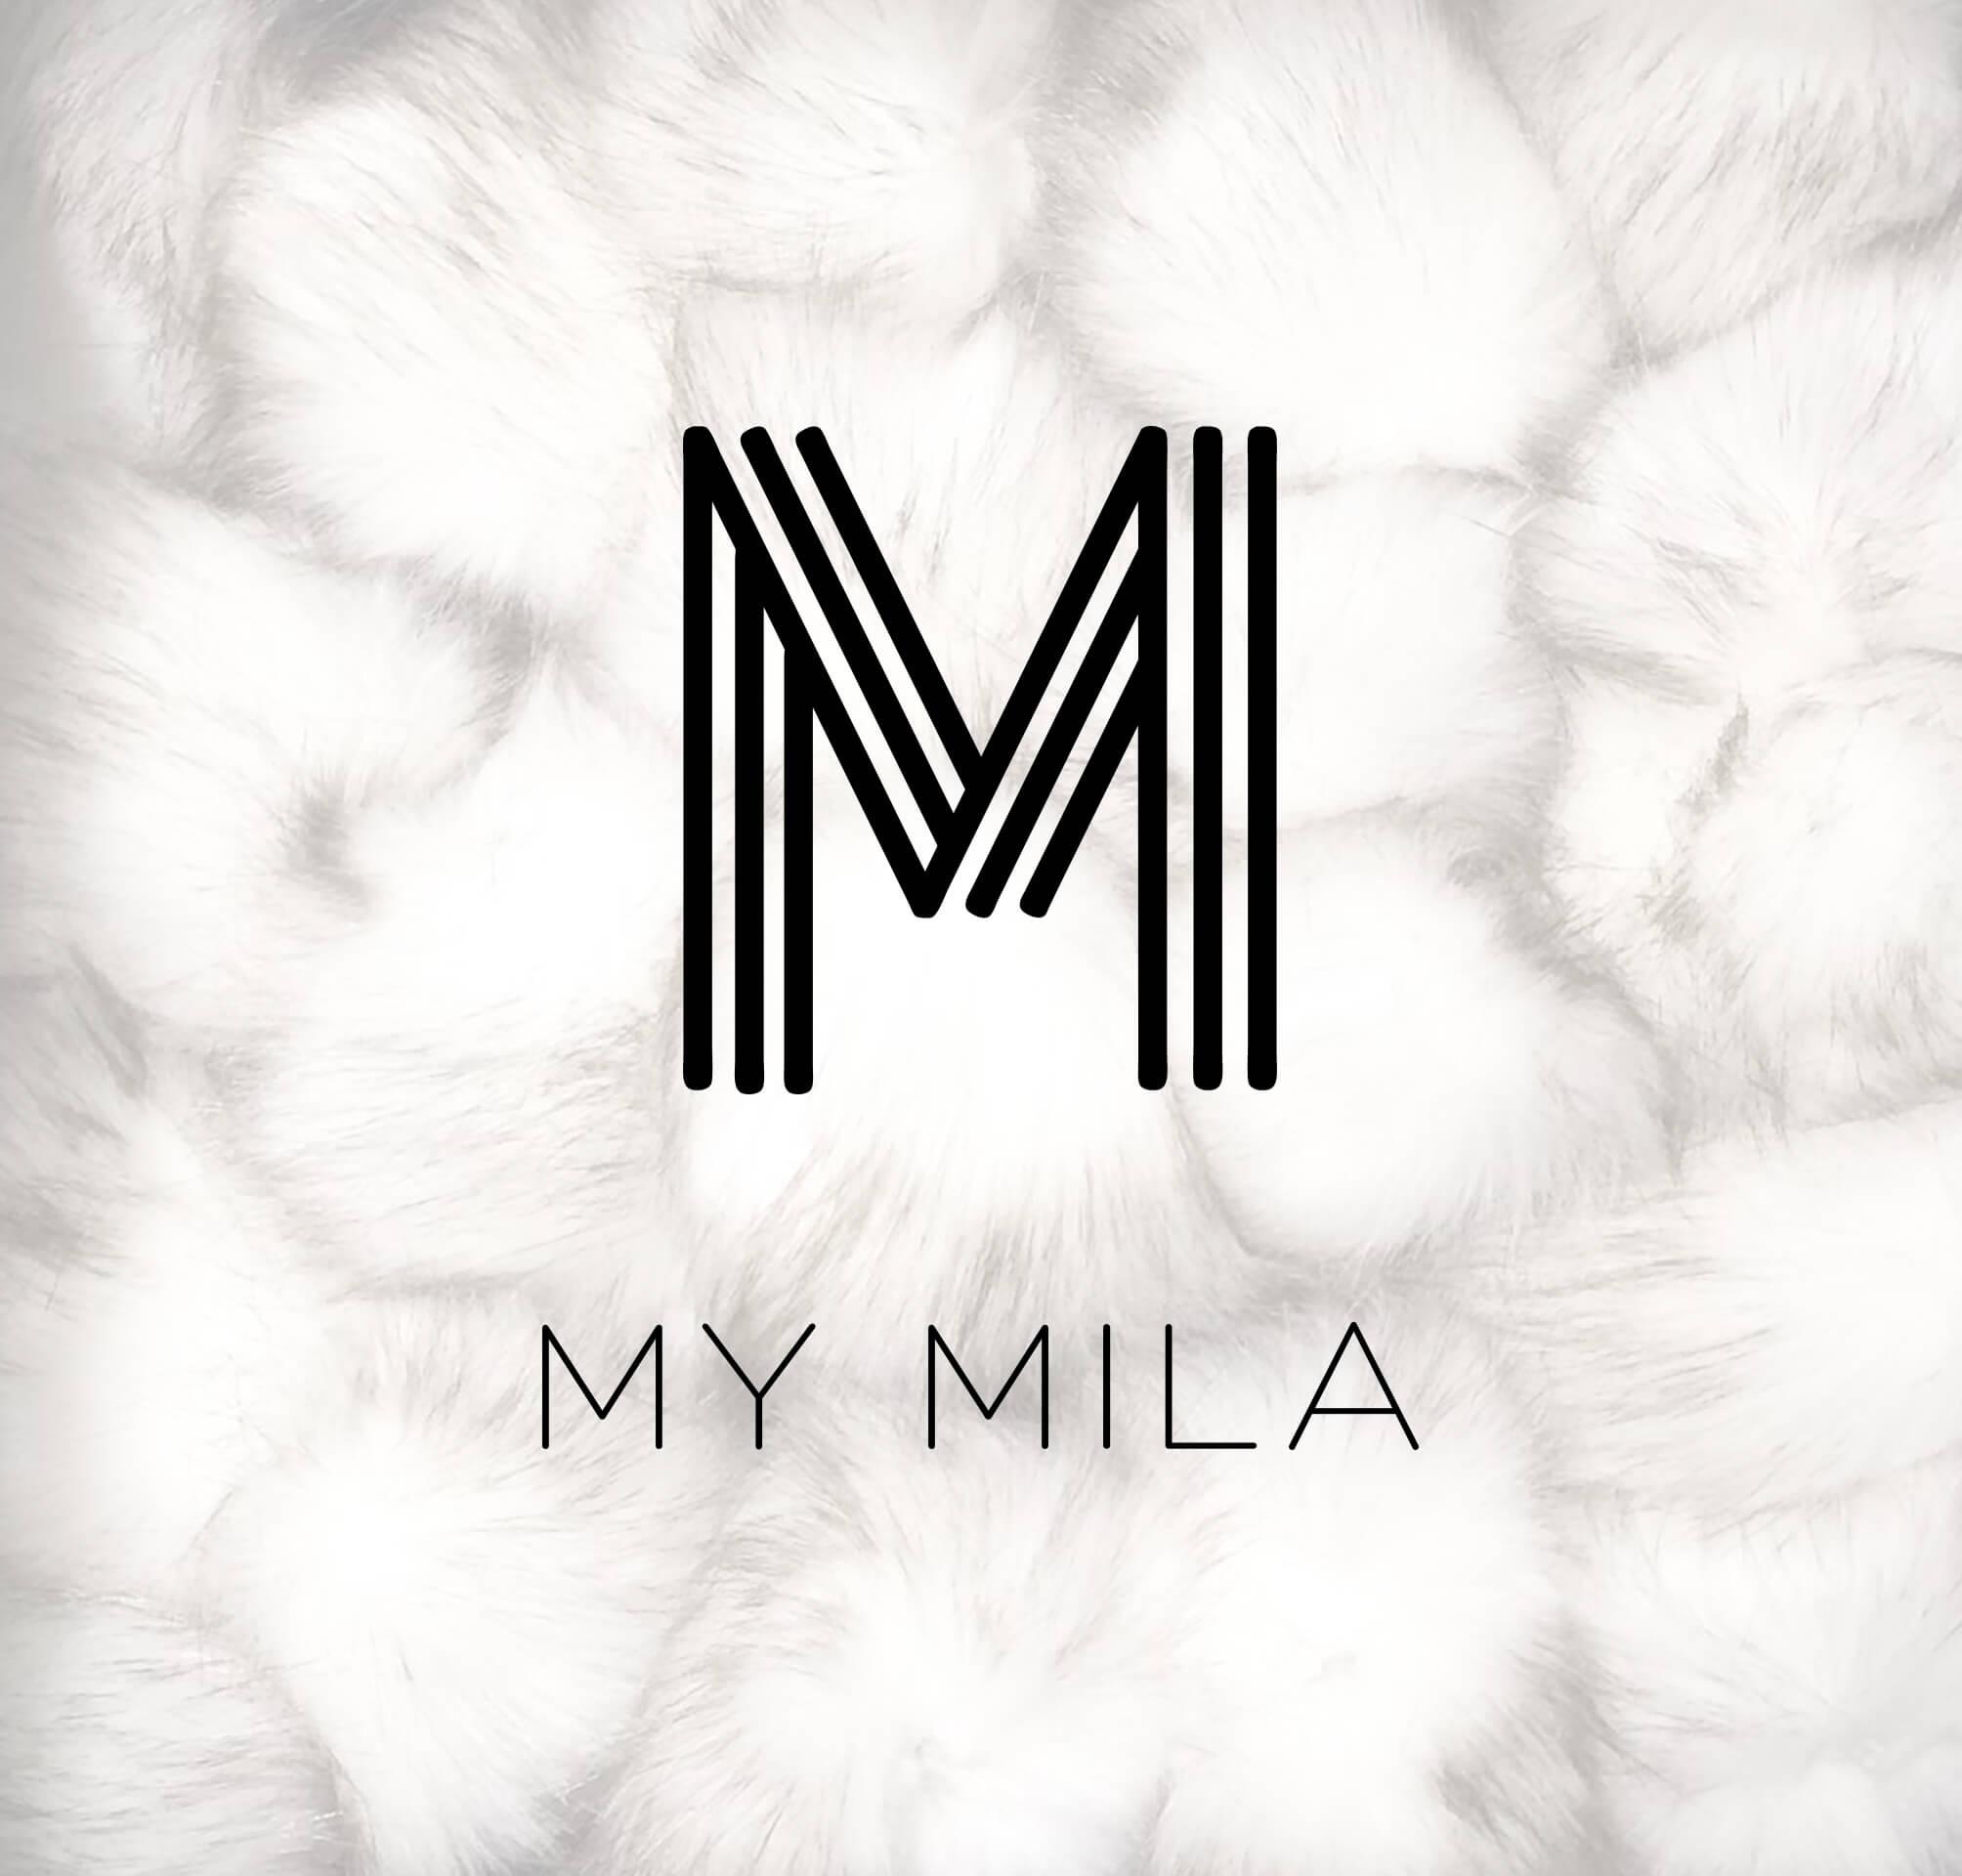 mymila_brand_design.jpg